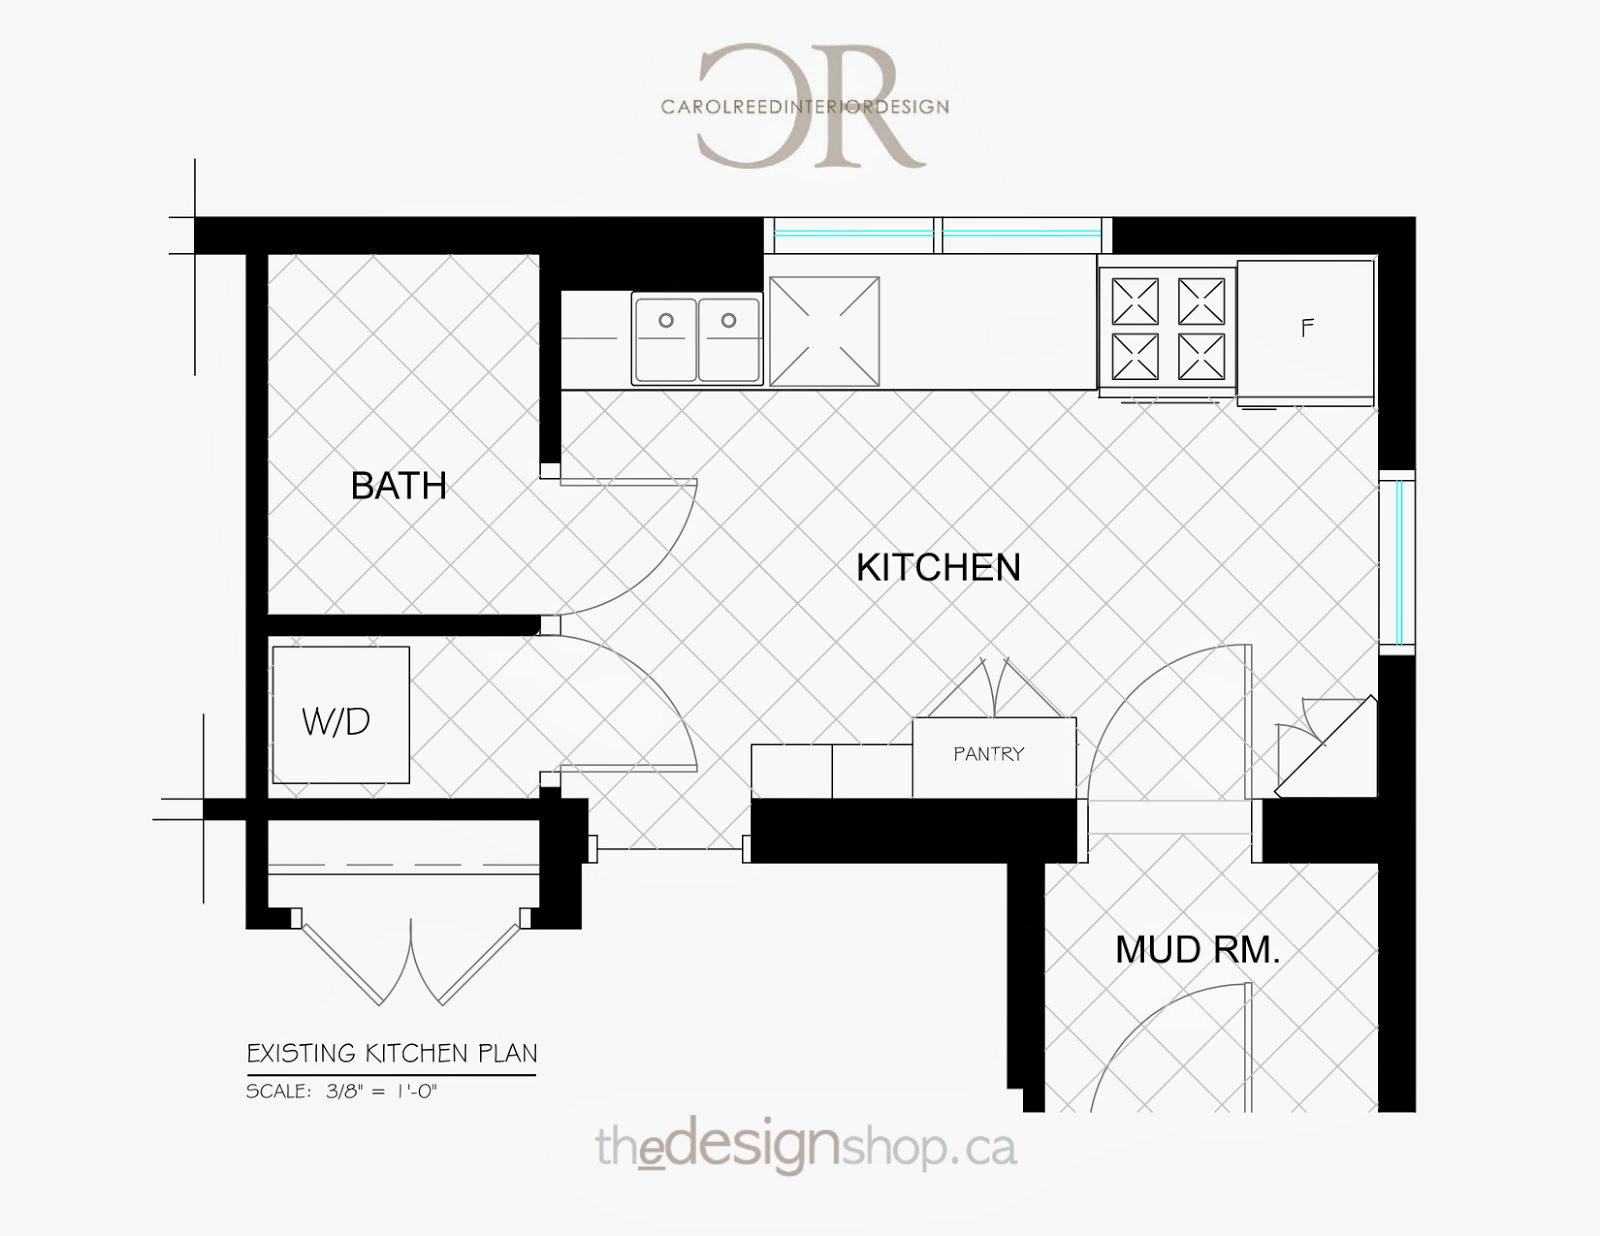 CREED: The Art Of Planning: Karen's Kitchen